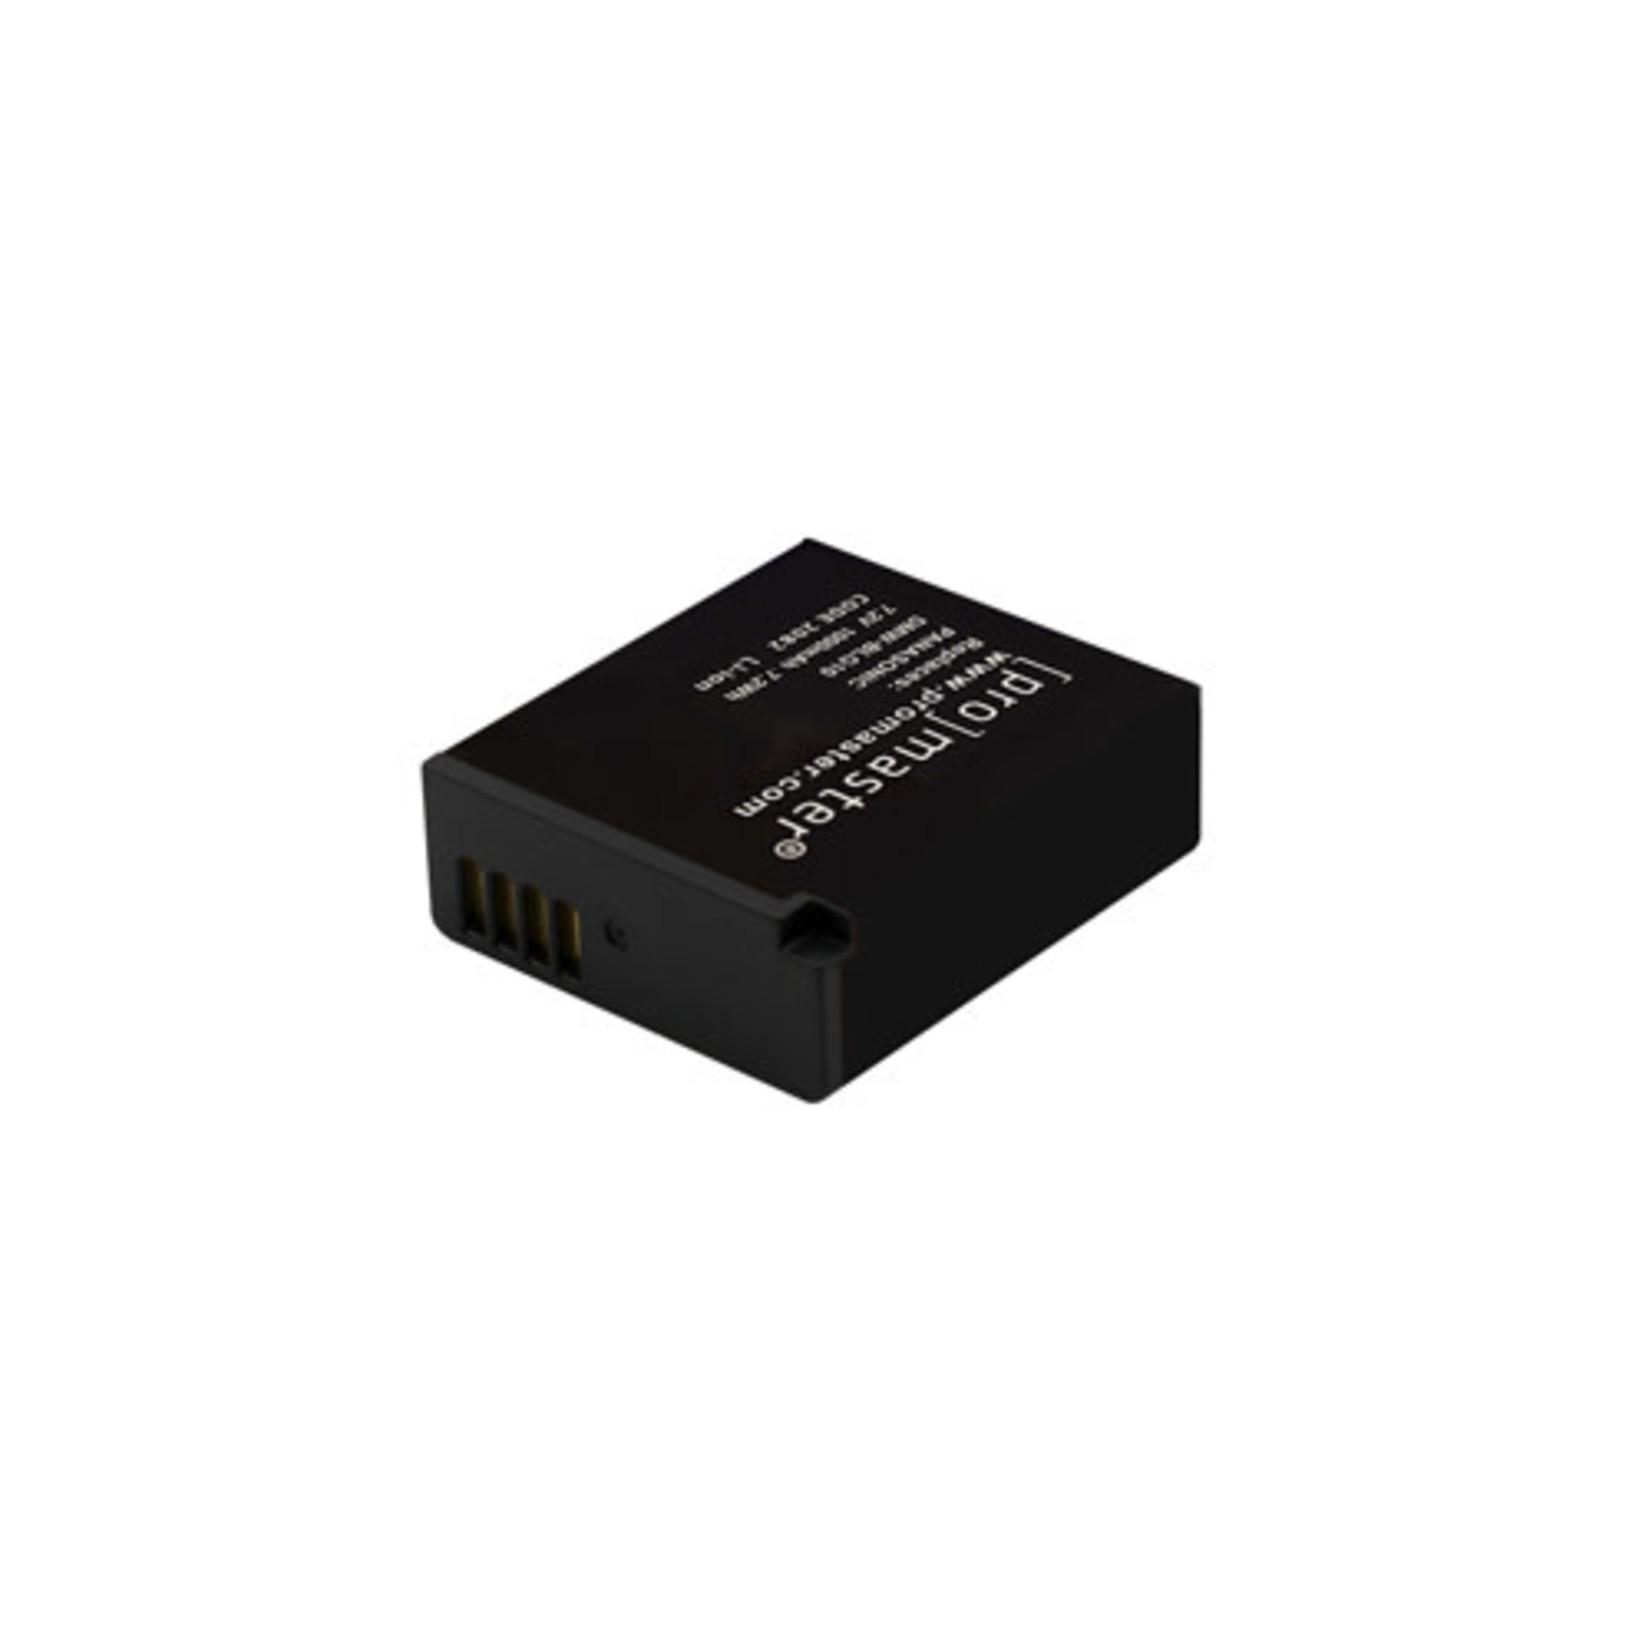 ProMaster Li-ion Battery for Panasonic DMW-BLG10